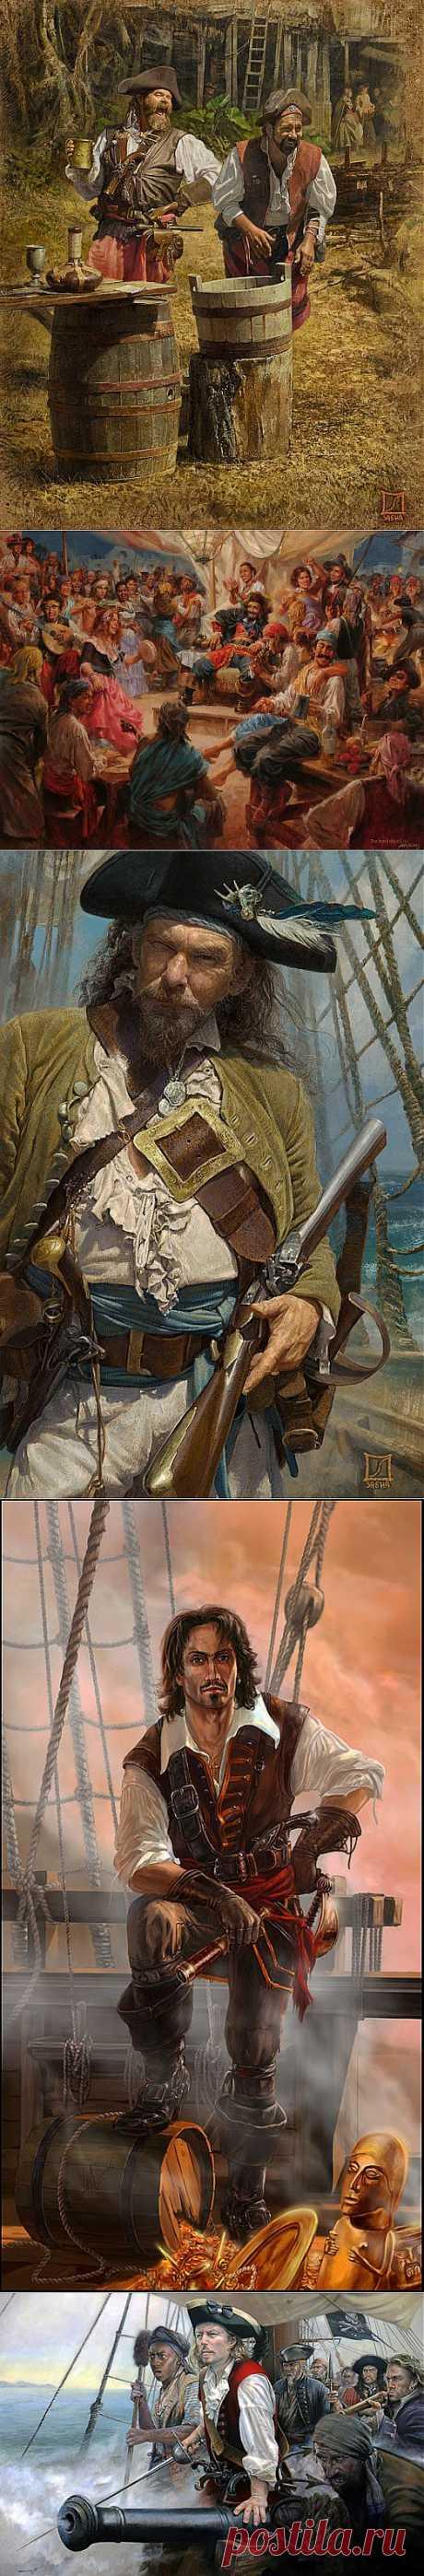 Пираты.....